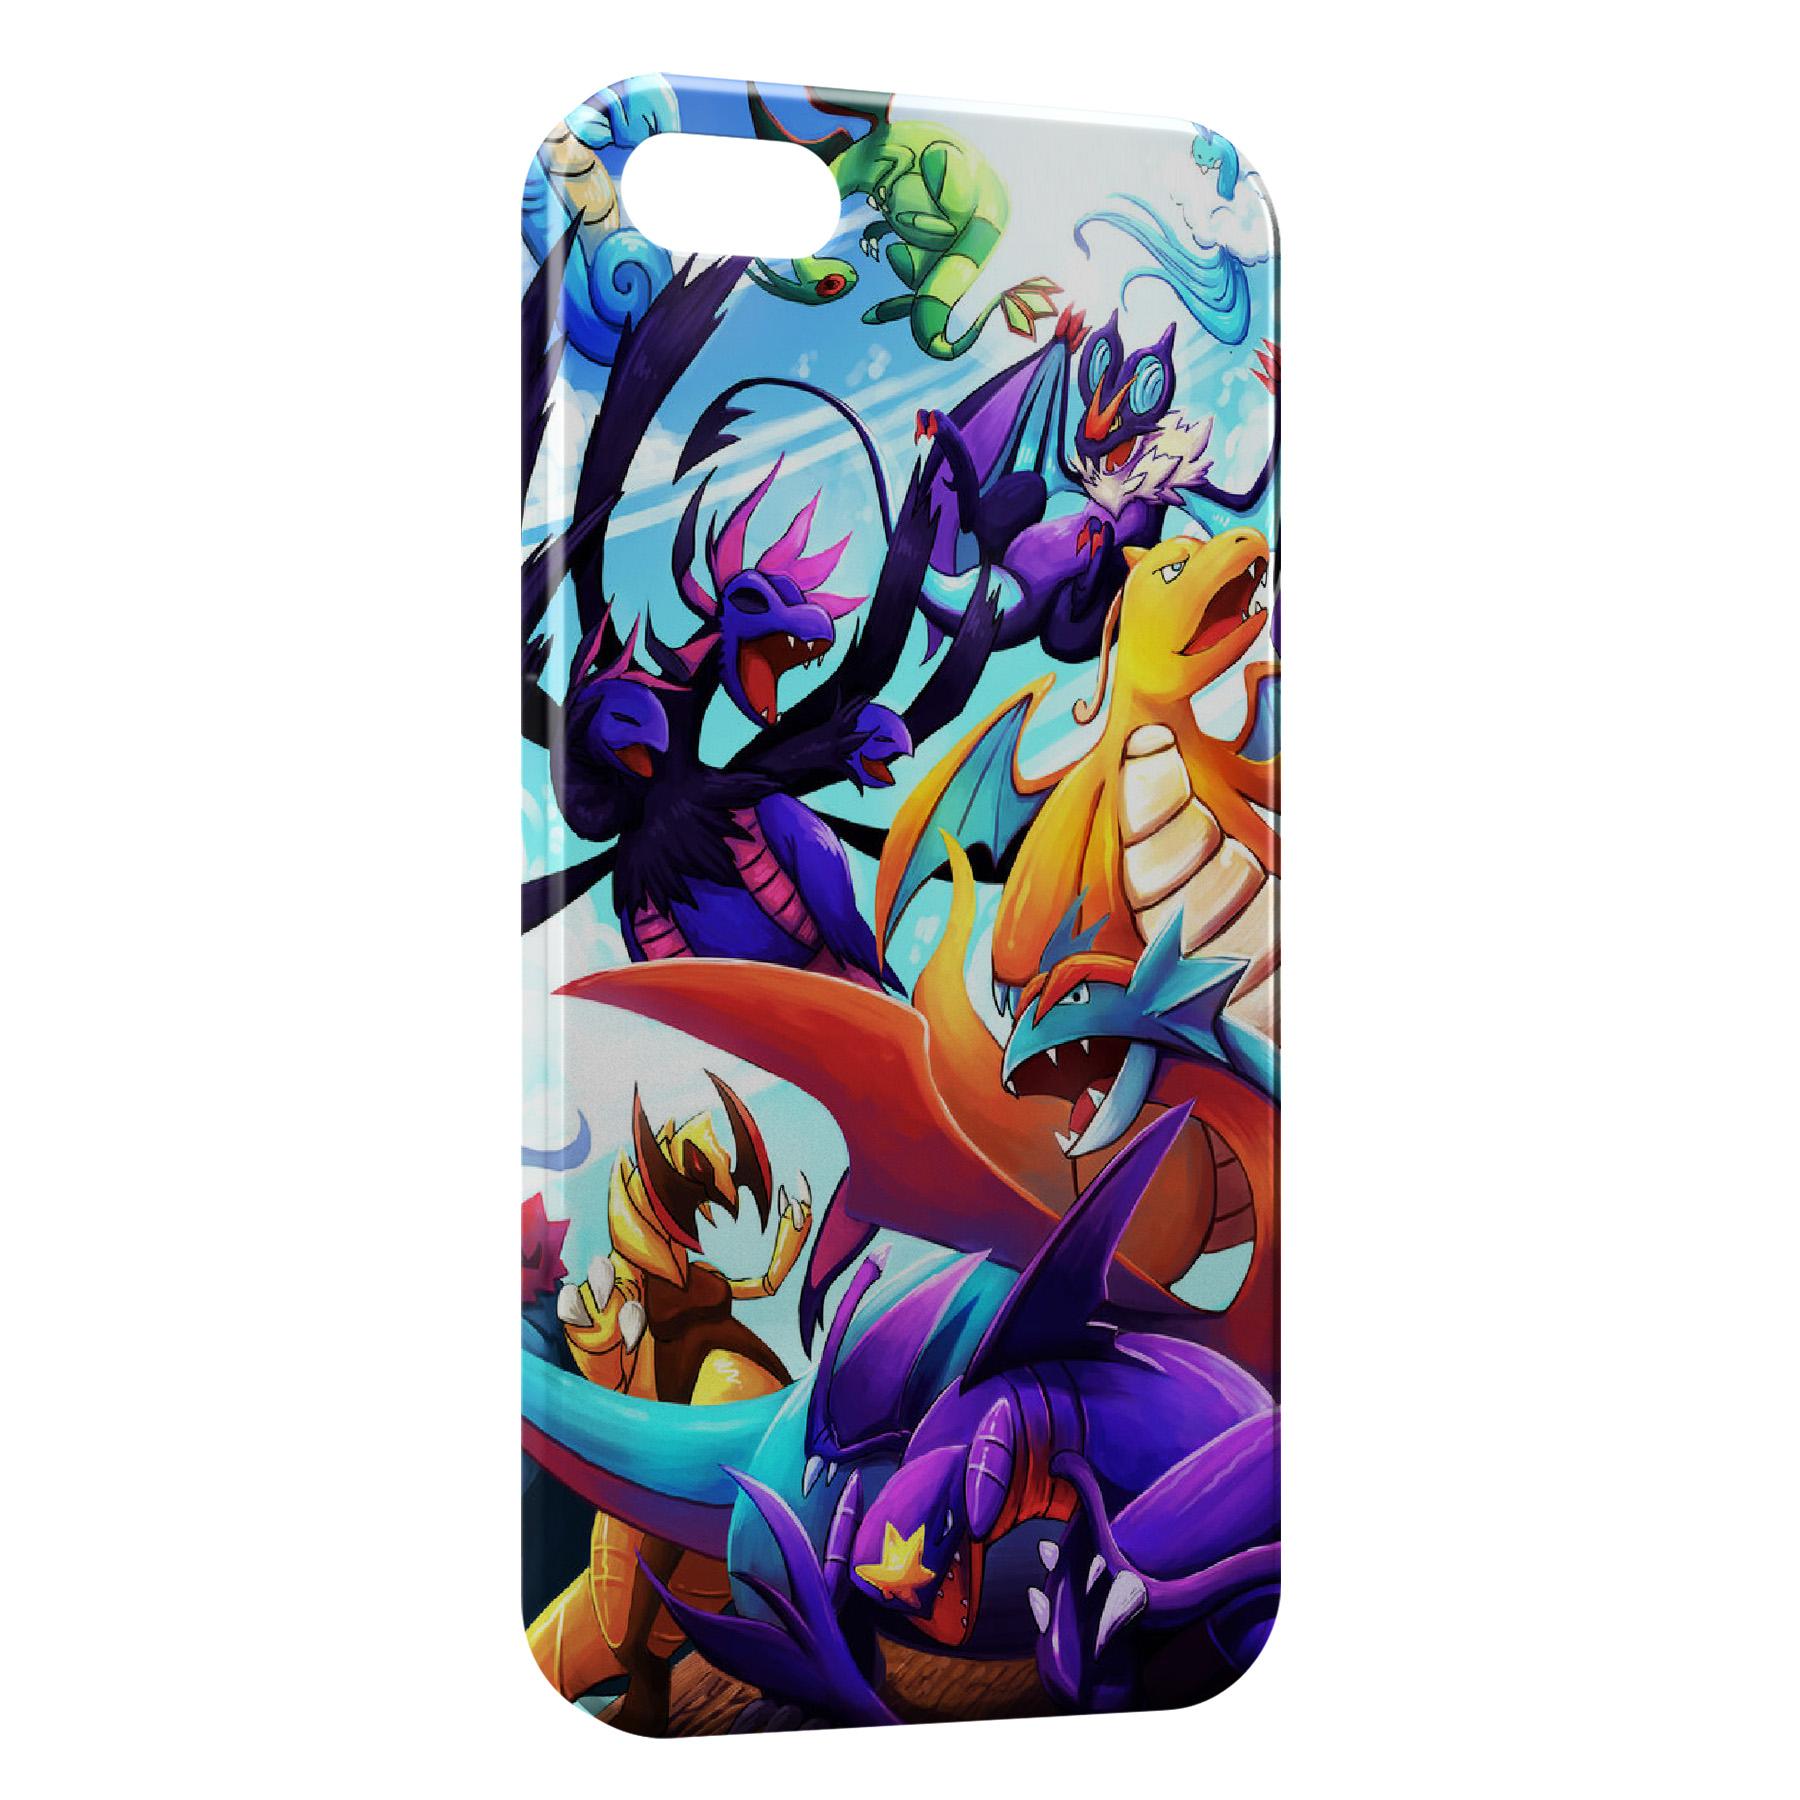 Coque Iphone 5c Dracolosse Dracaufeu Pokemon Graphic